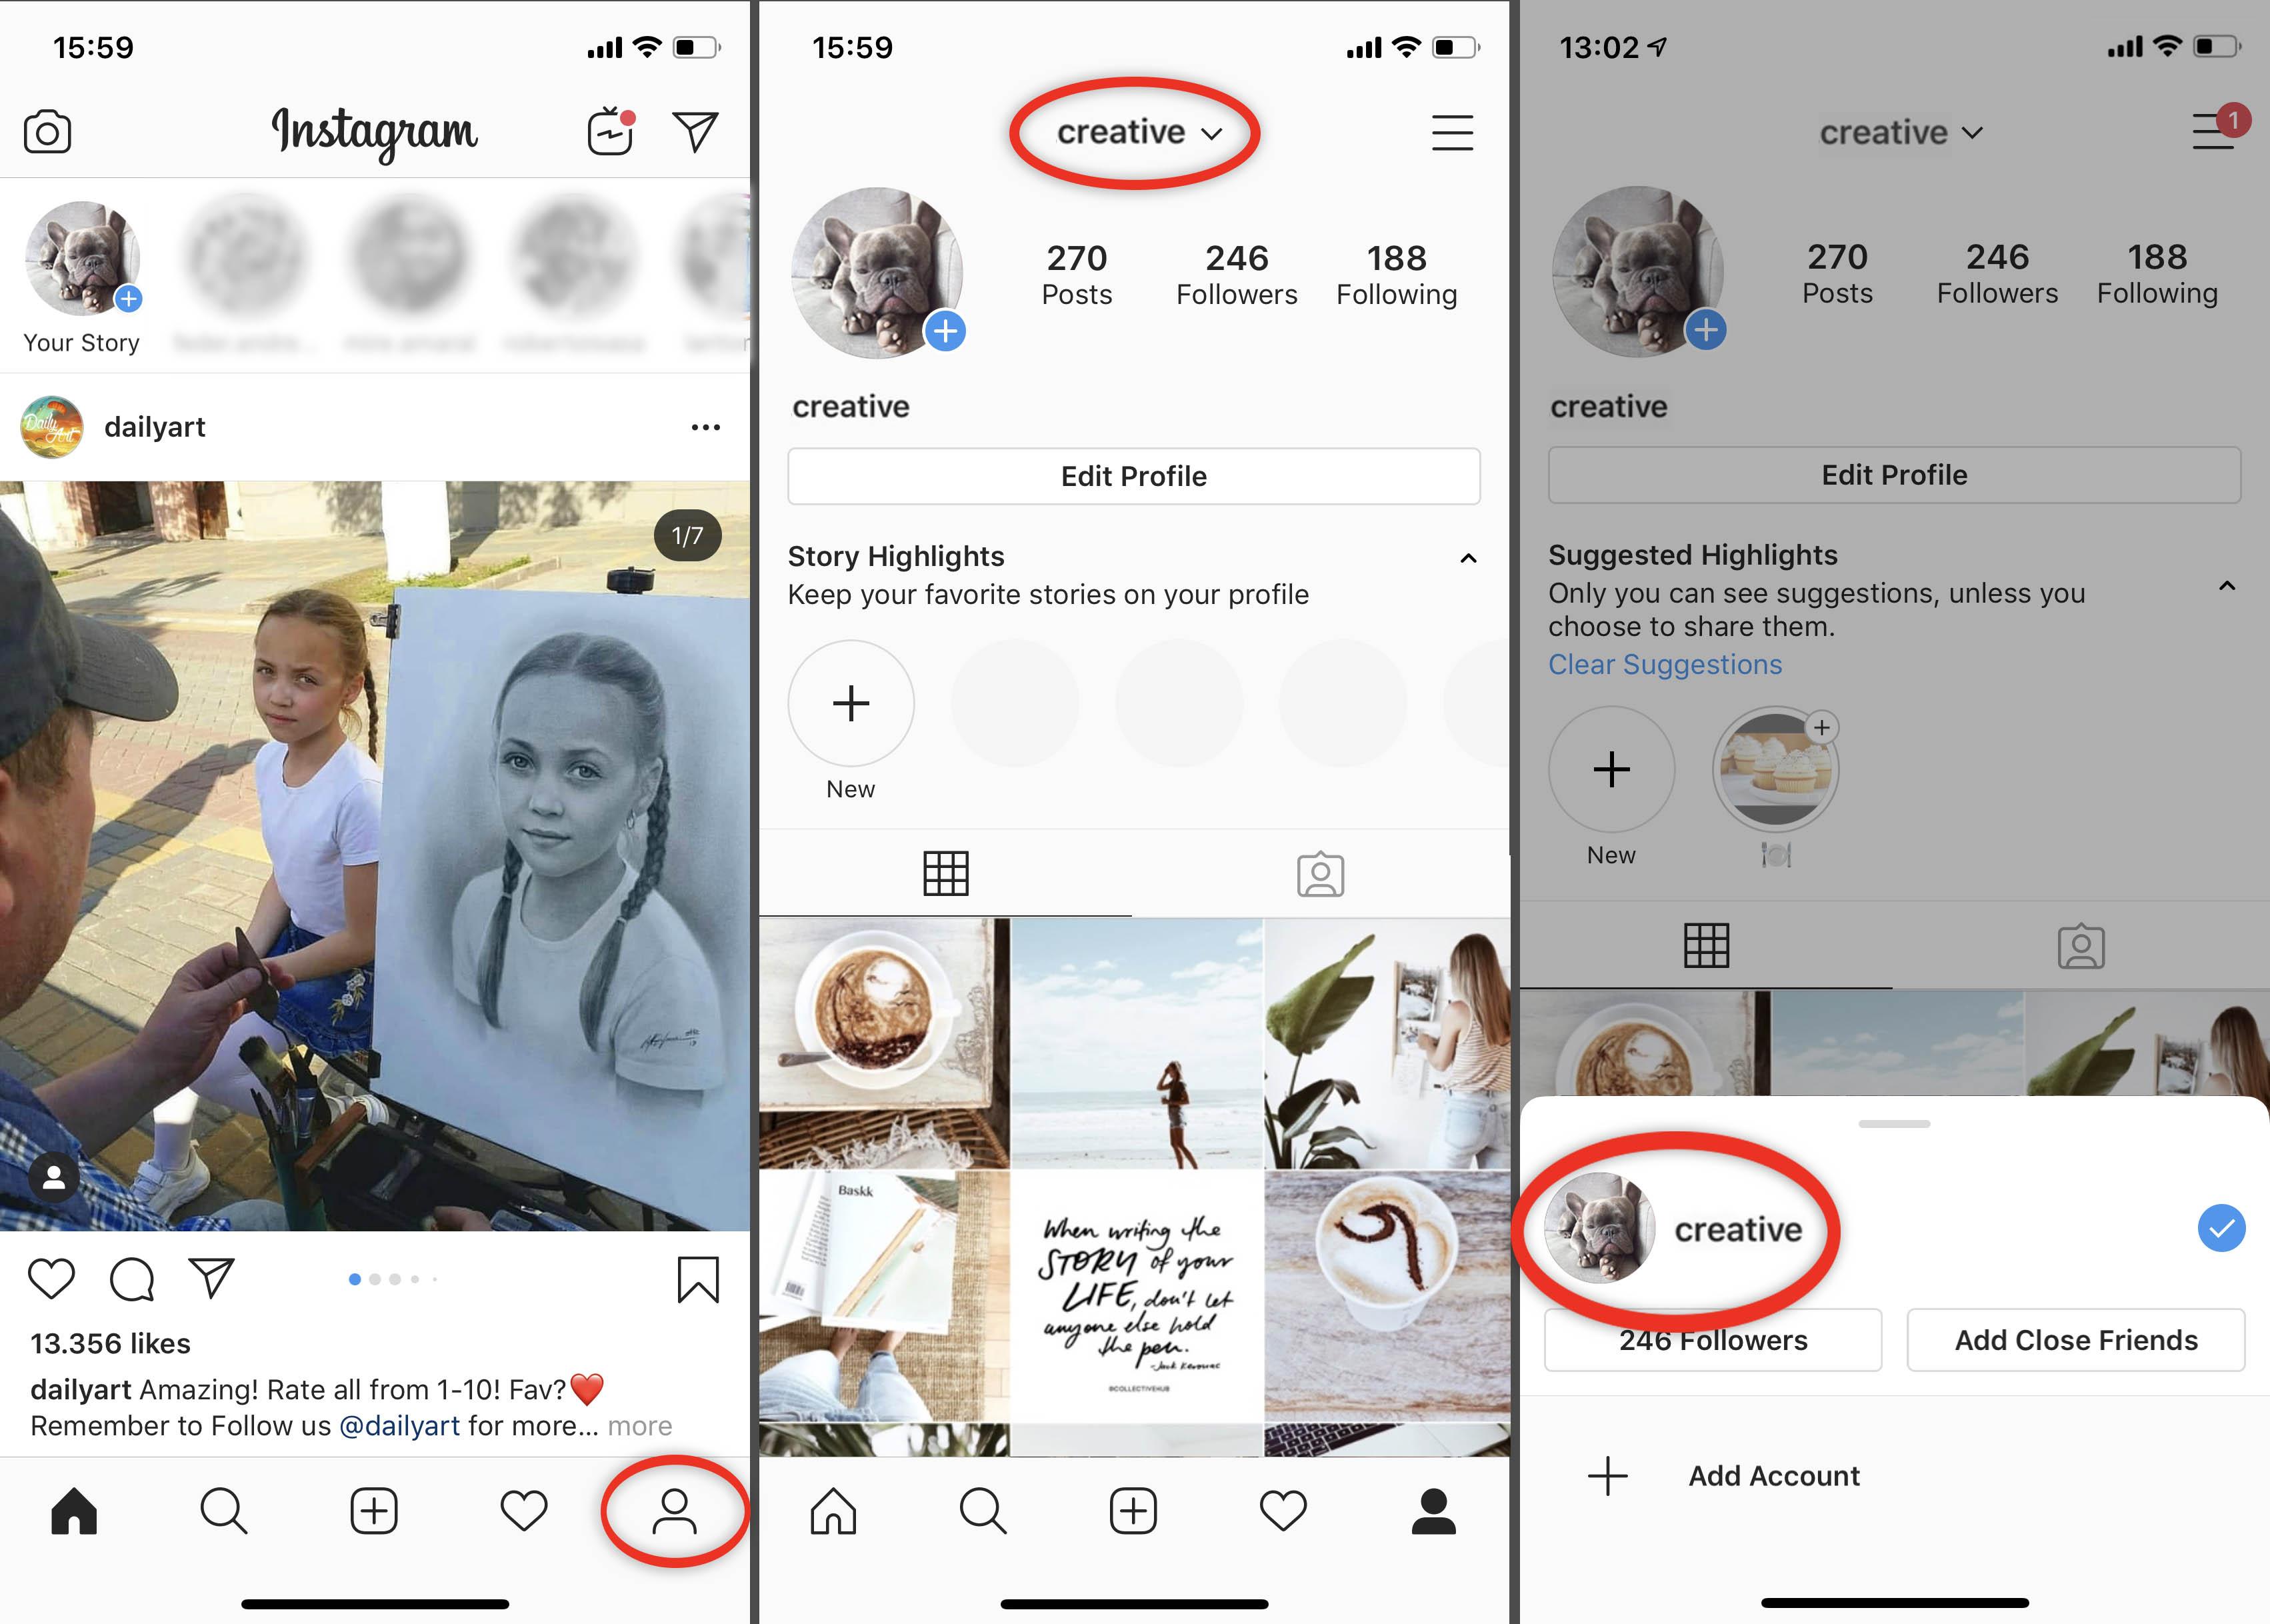 Linked Instagram accounts